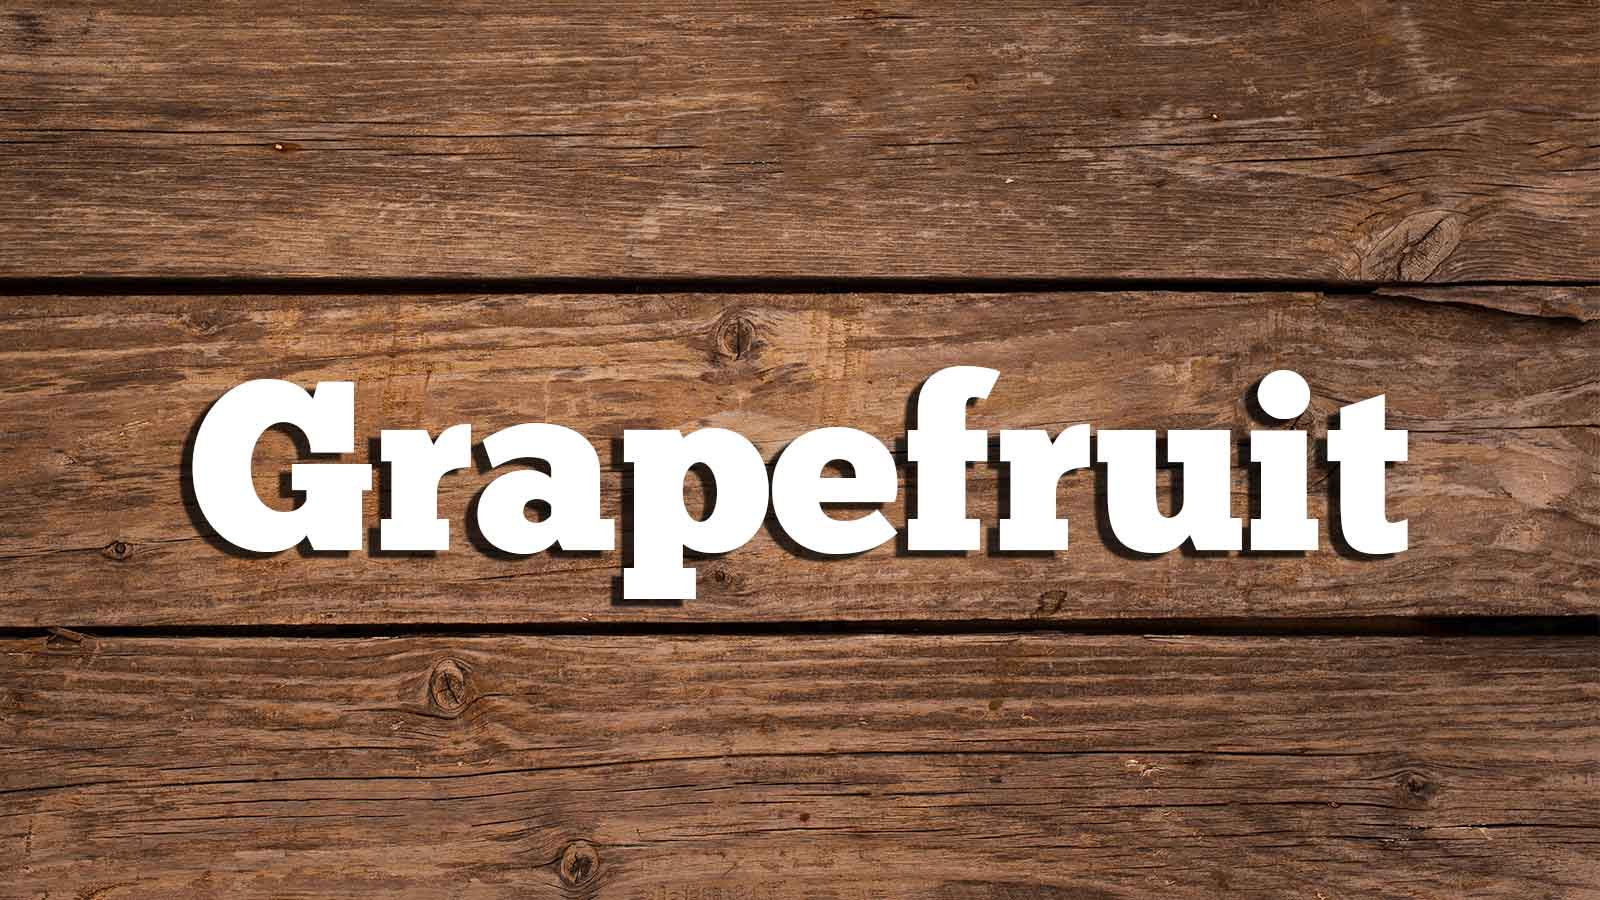 Image for Grapefruit